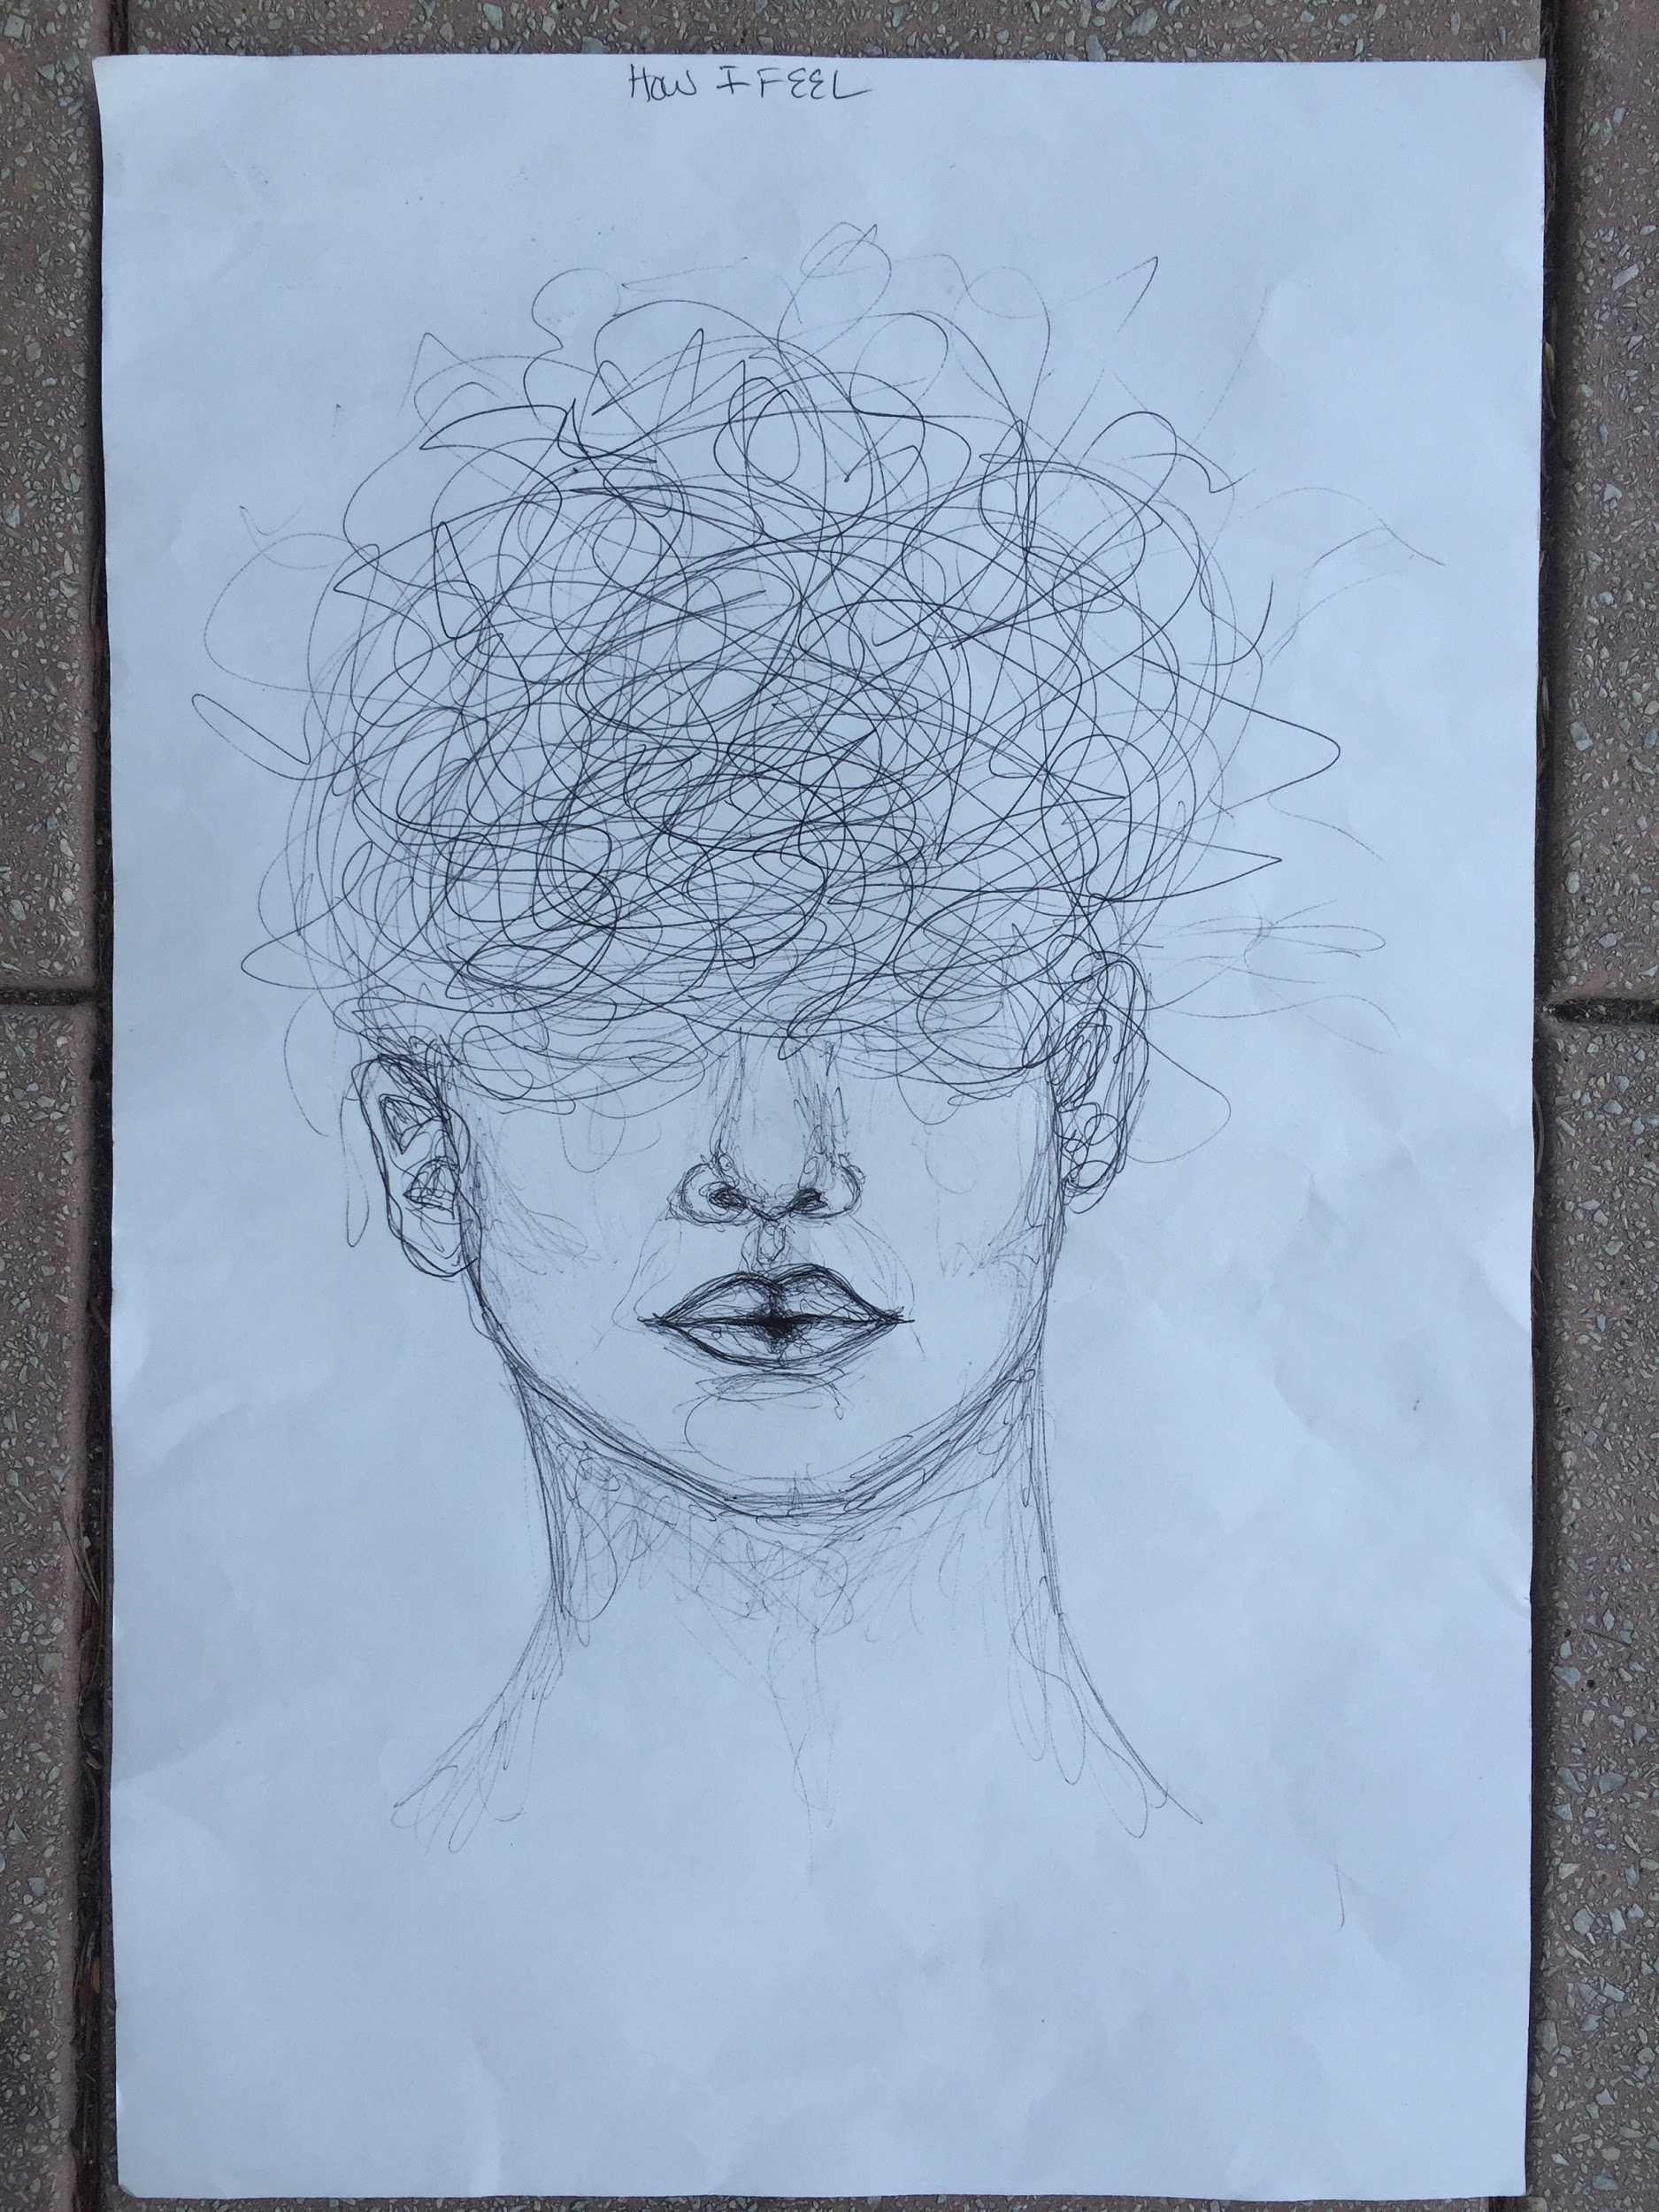 The Panic: Teens And Anxiety Disorders